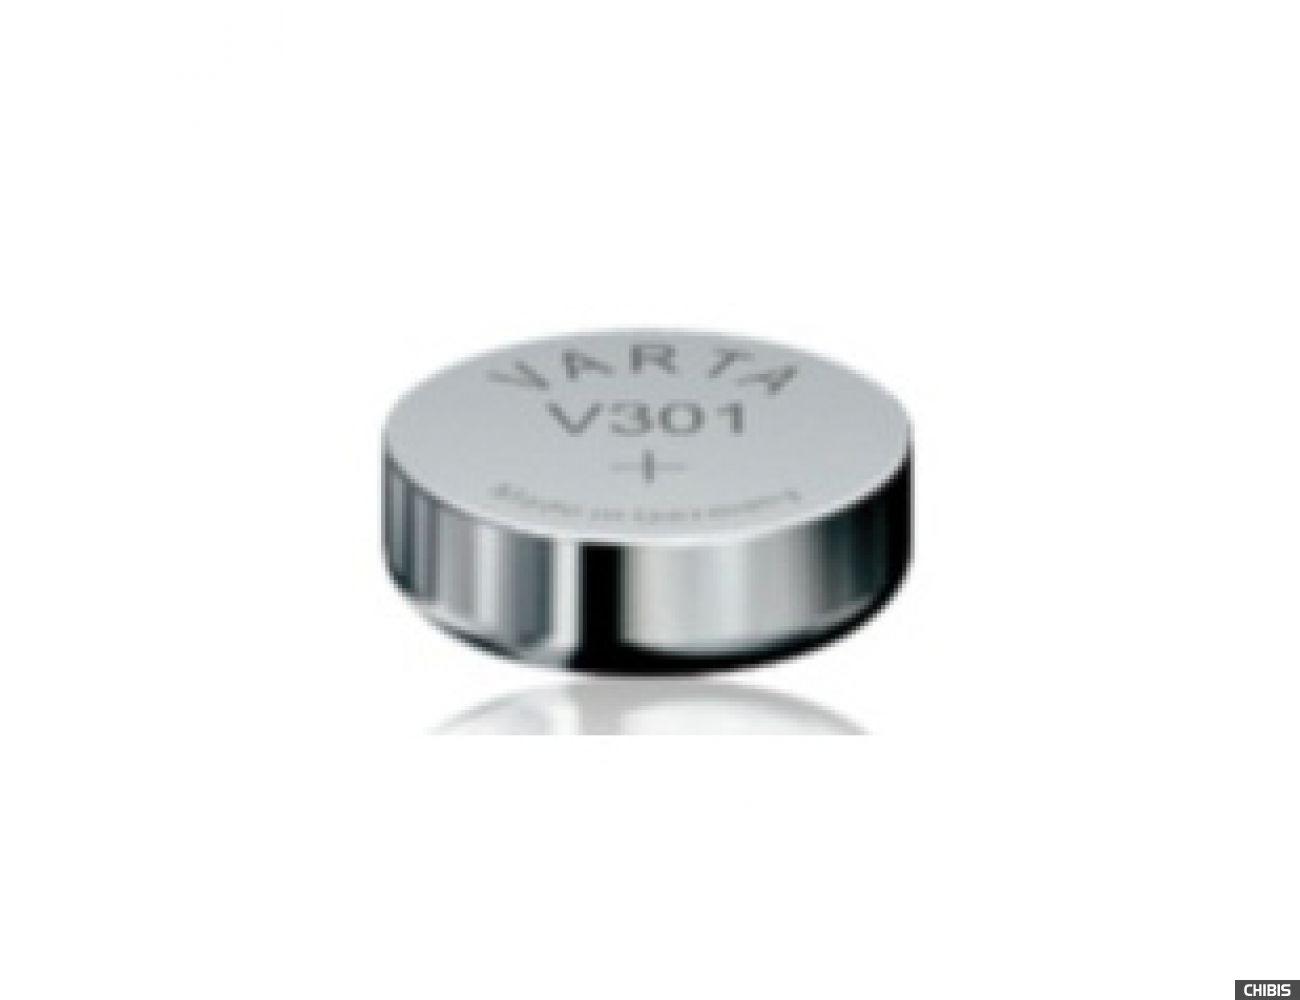 Батарейка Varta V301 (SR43 115mAh 1.55V оксид Серебра) 00301101111